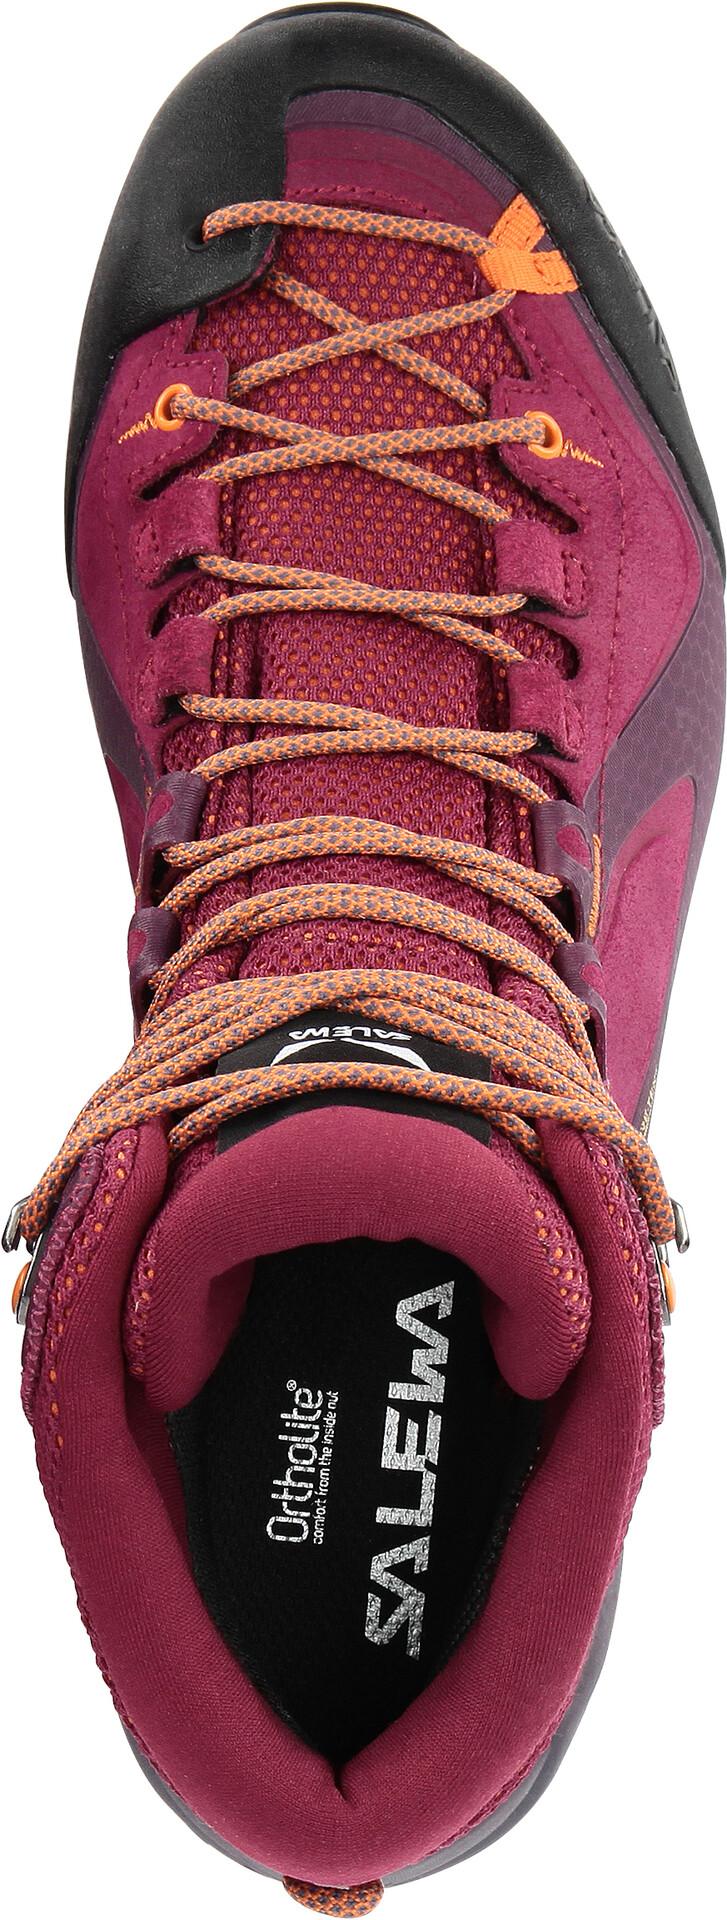 SALEWA Alpenviolet GTX Mid Shoes Women red plumorange popsicle